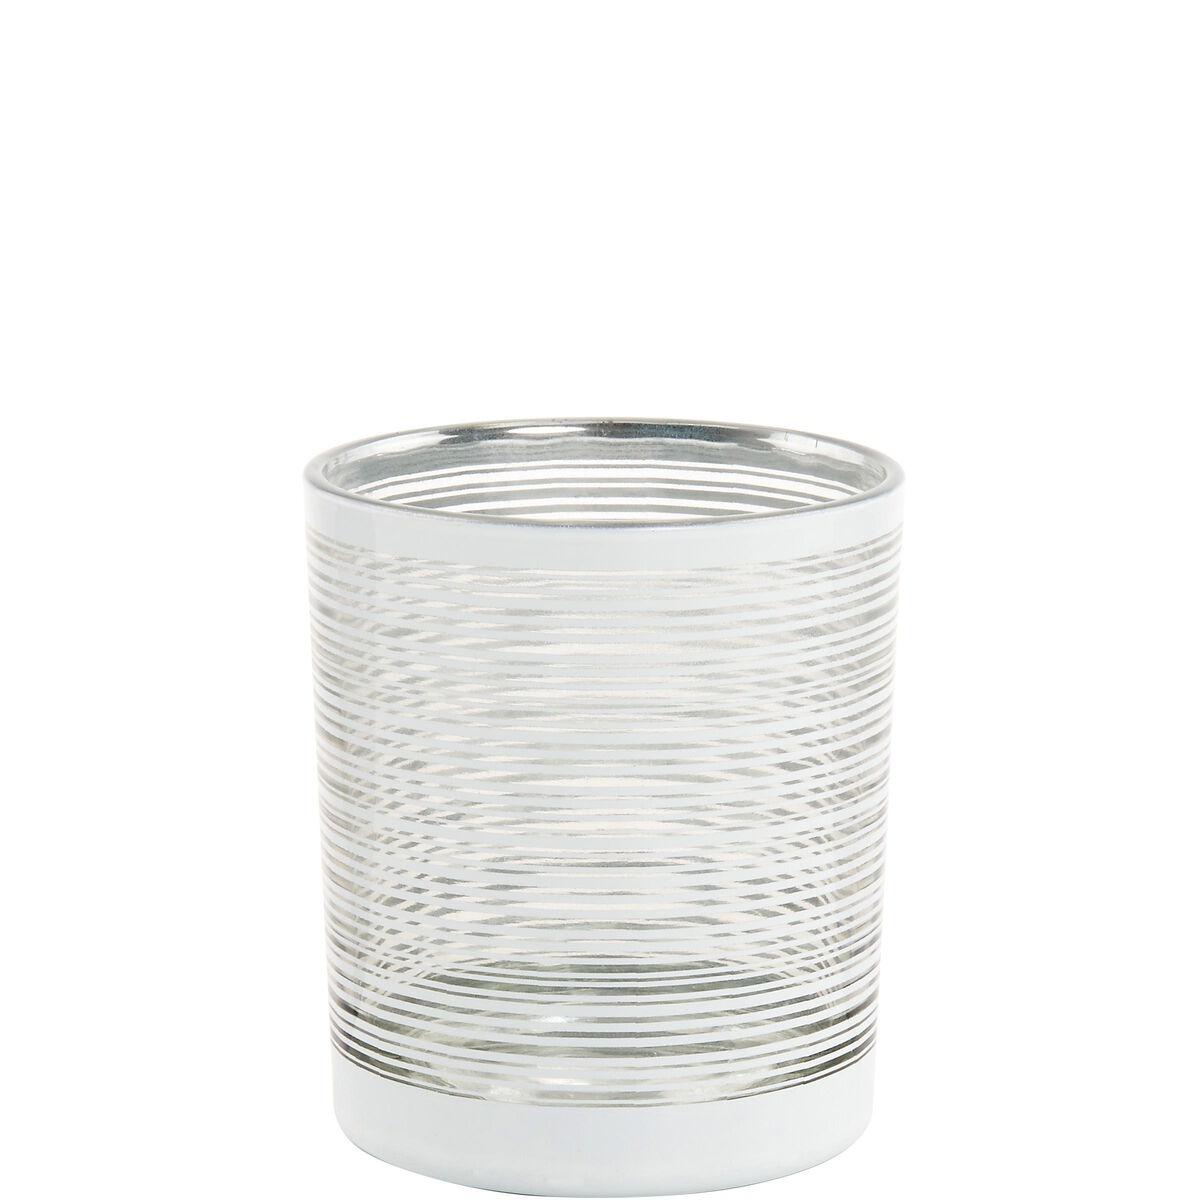 DELIGHT Teelichthalter 10cm, silber